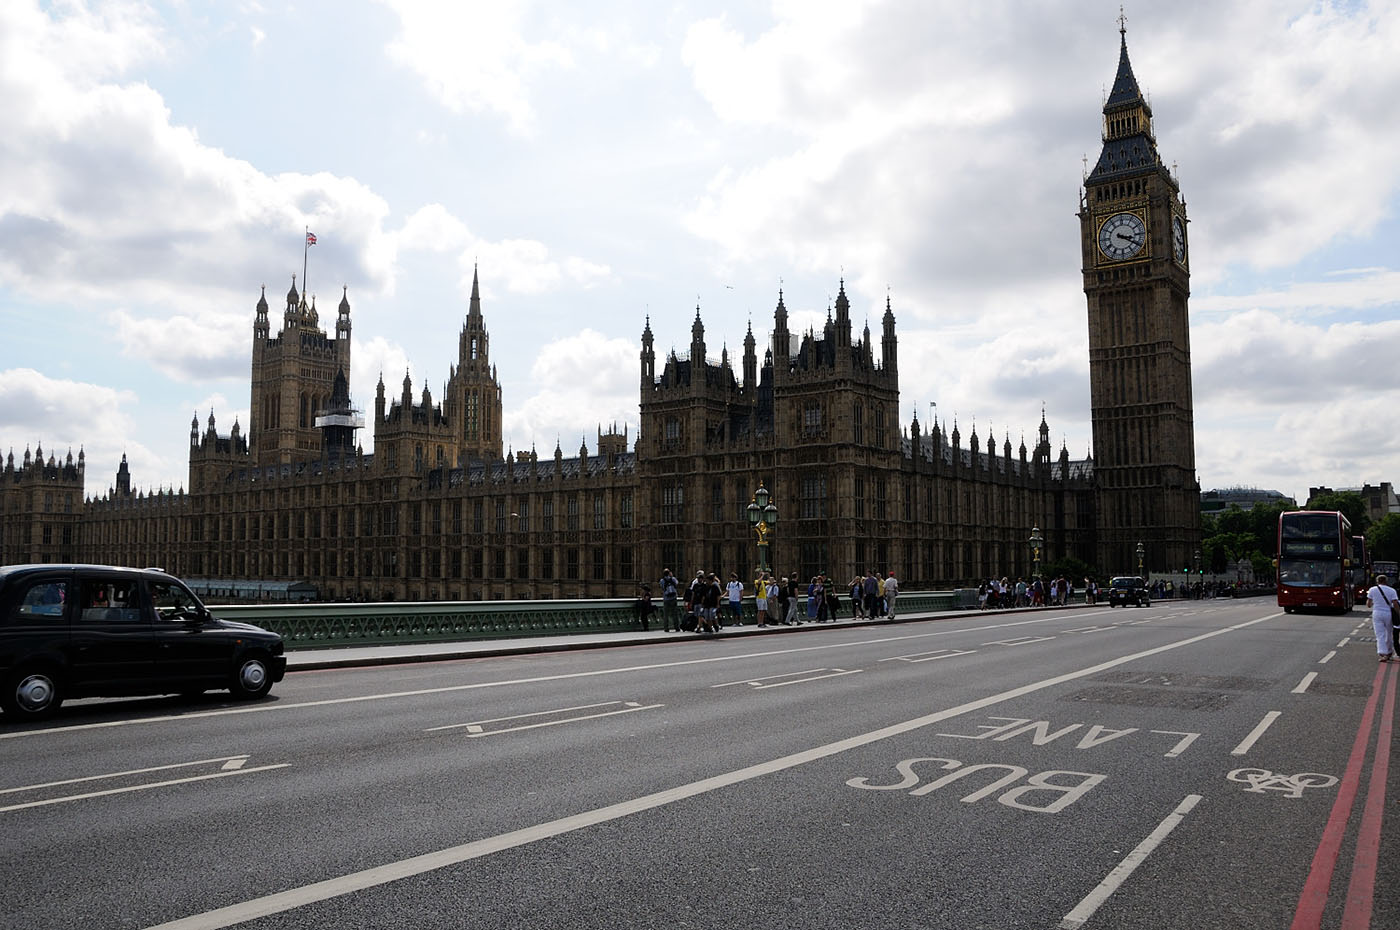 Фотография 1. Обзор камеры Nikon D300s KIT 18-105. Лондон. Биг Бен. Параметры съемки: ISO 200, F8, 1/800 s.